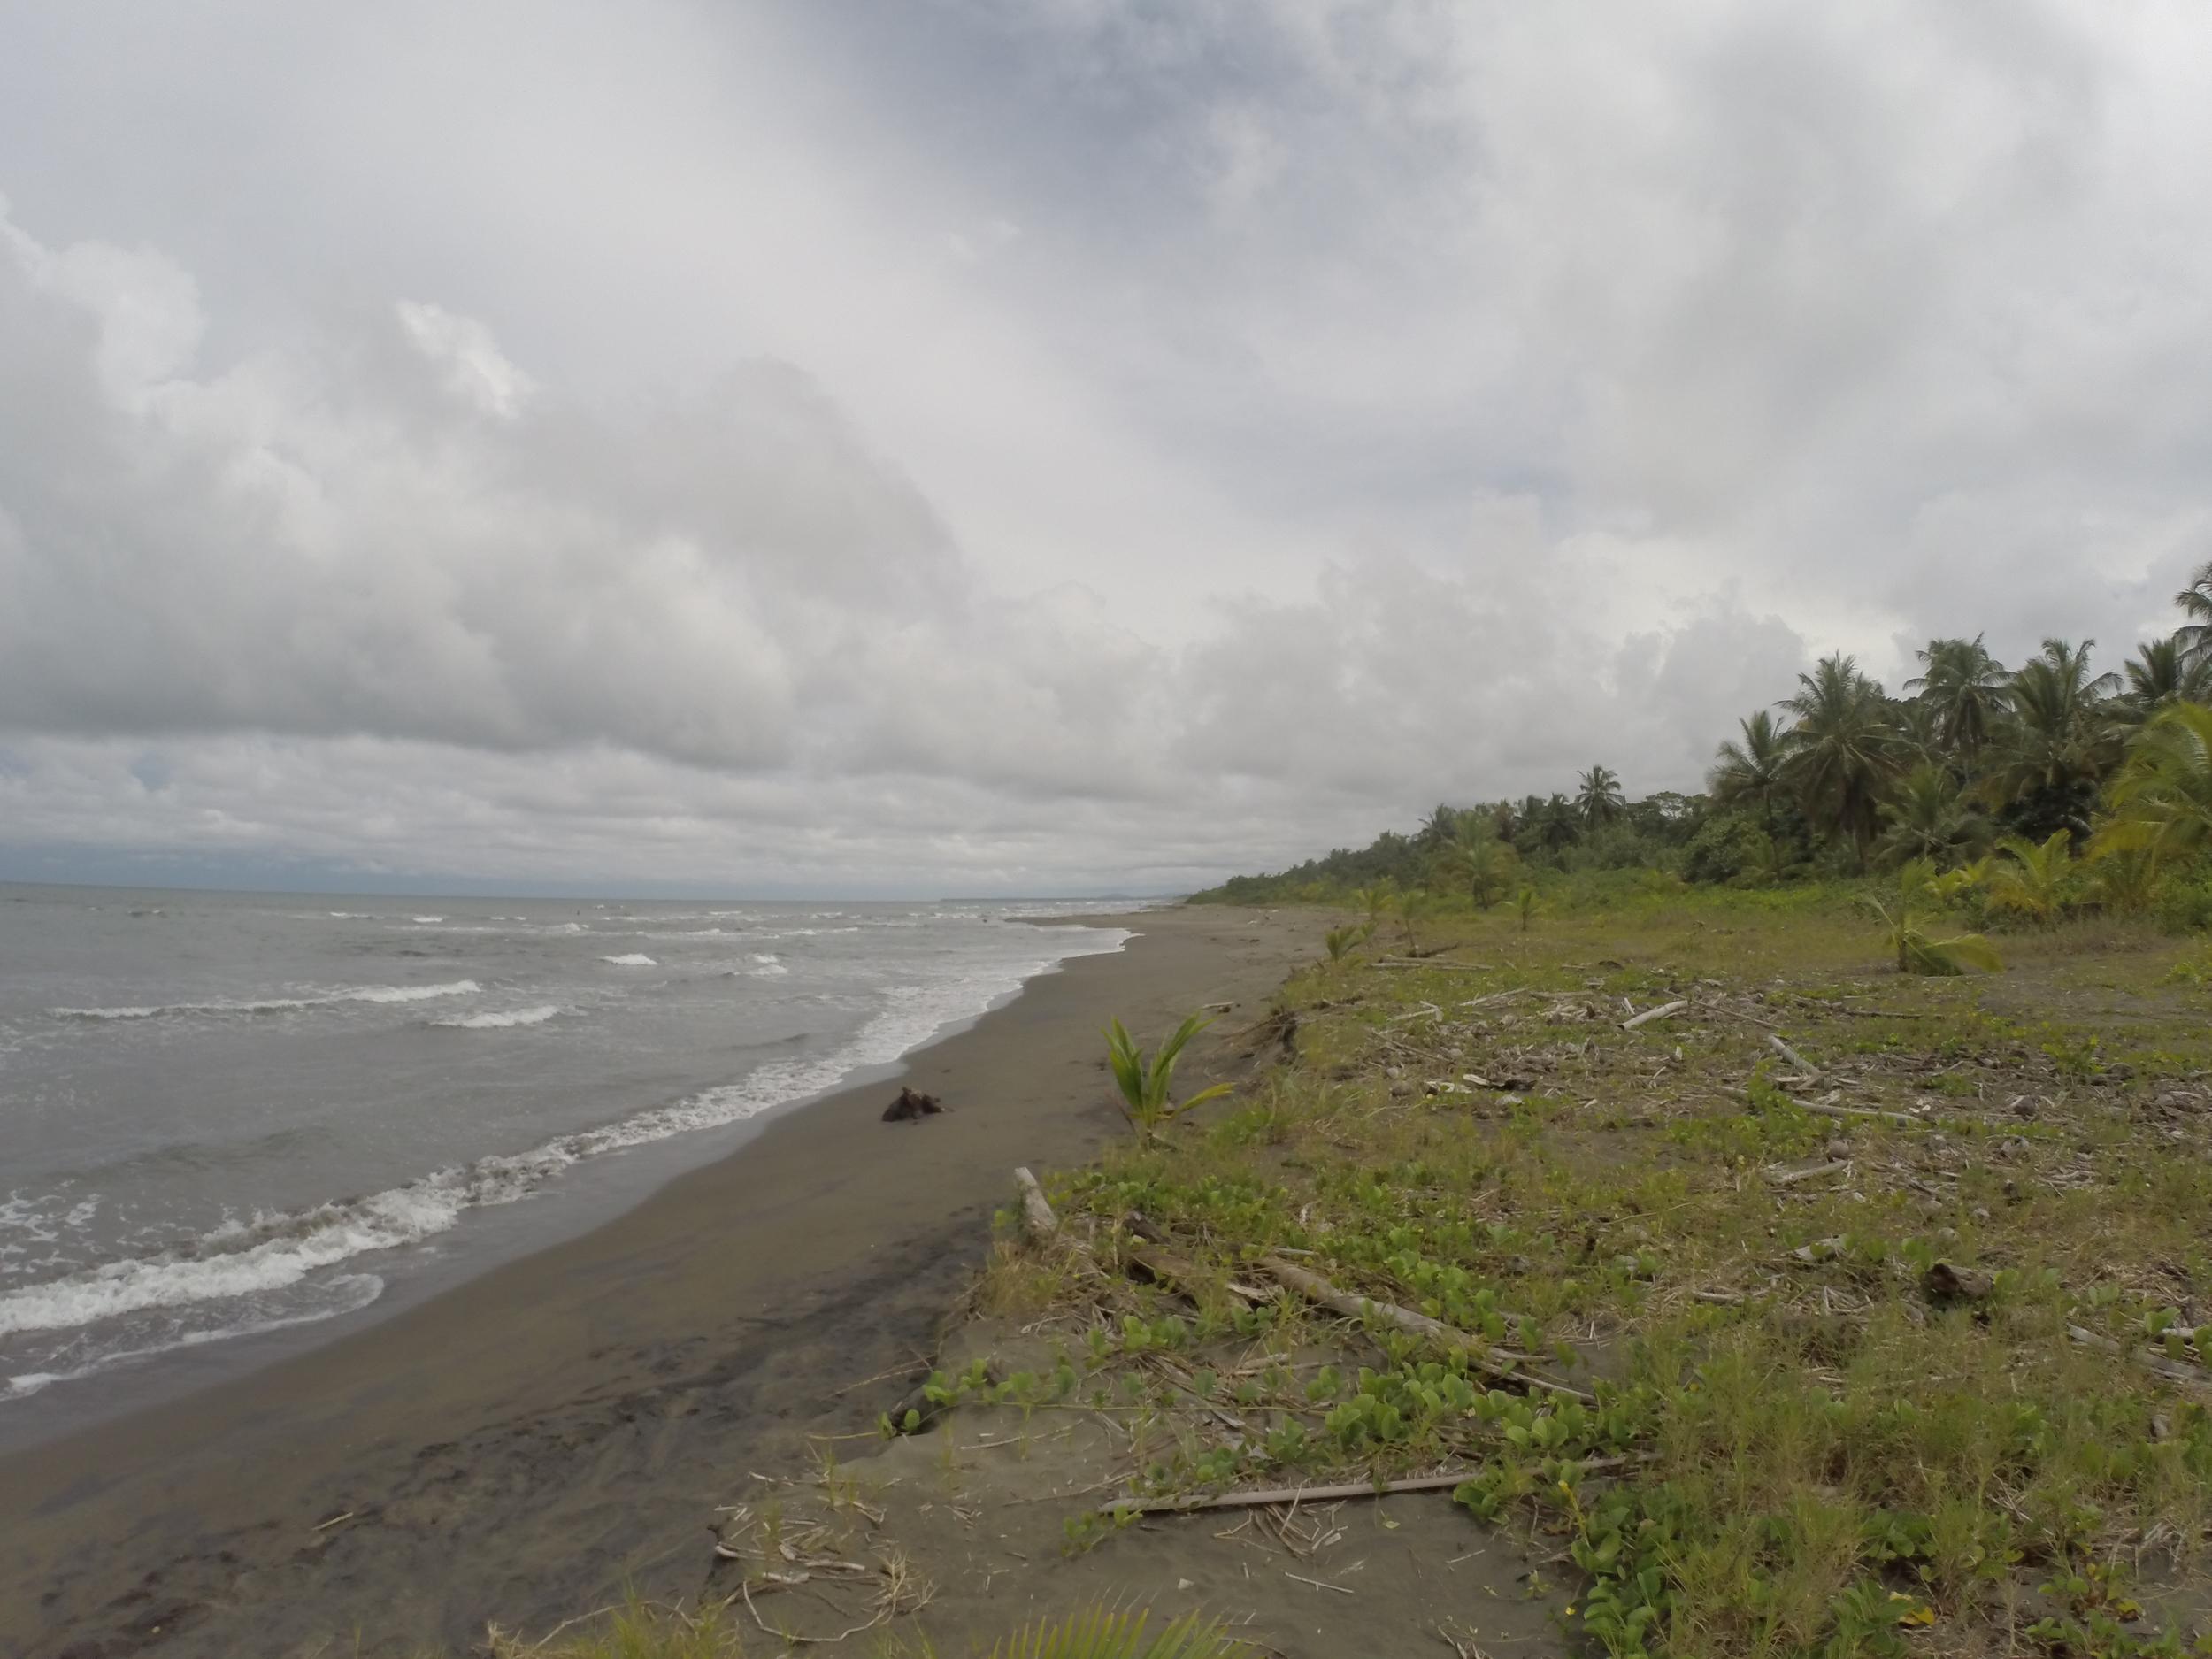 Caribbean at Costa Rica